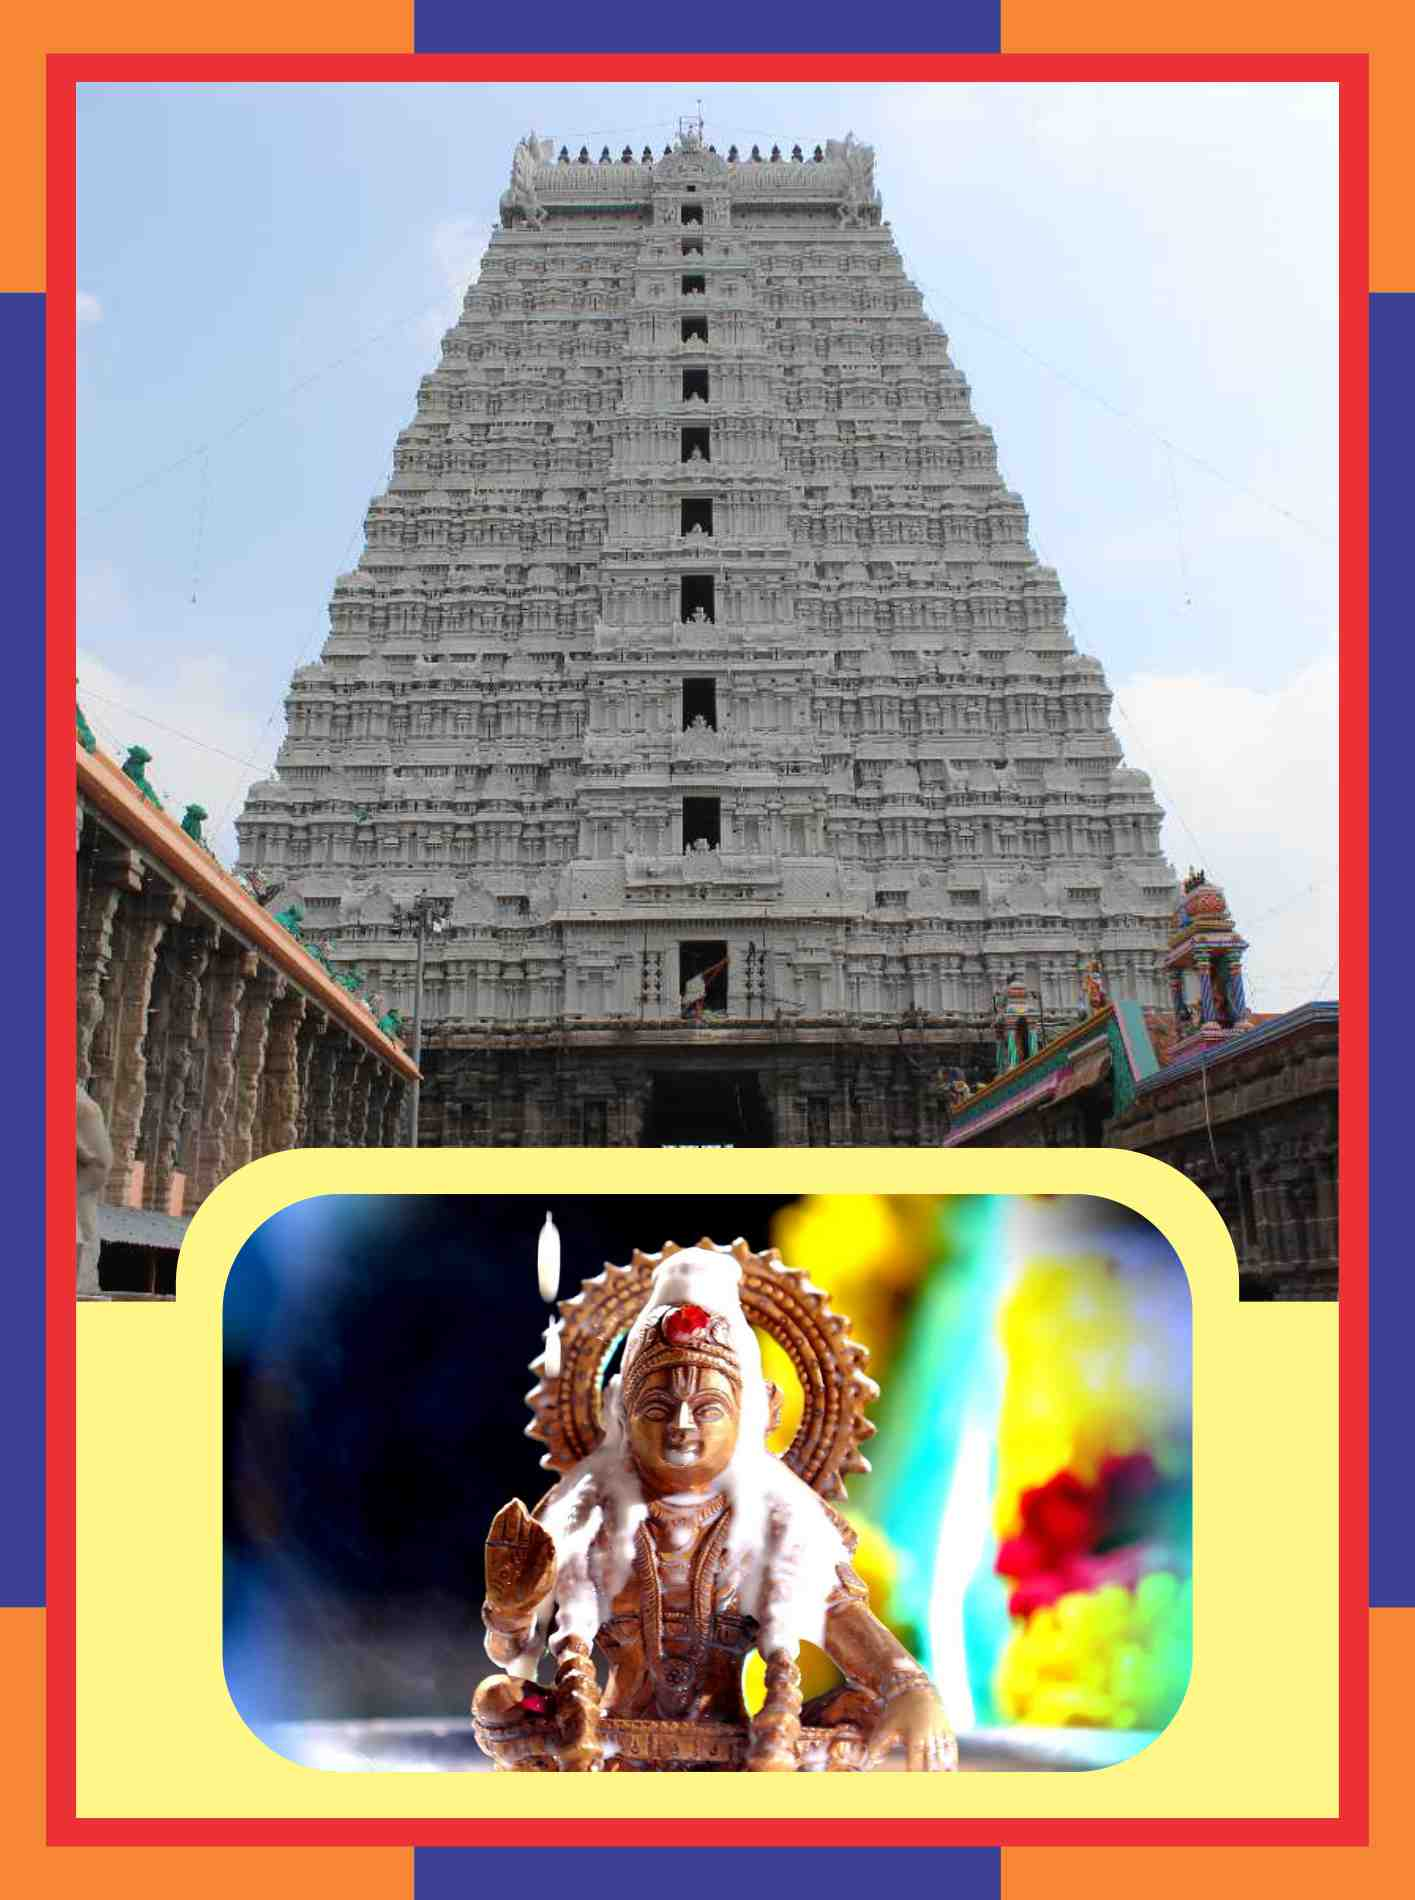 Thirukkandiyur - Sri Veeratteswarar Temple Spl Puja for Excel in Education